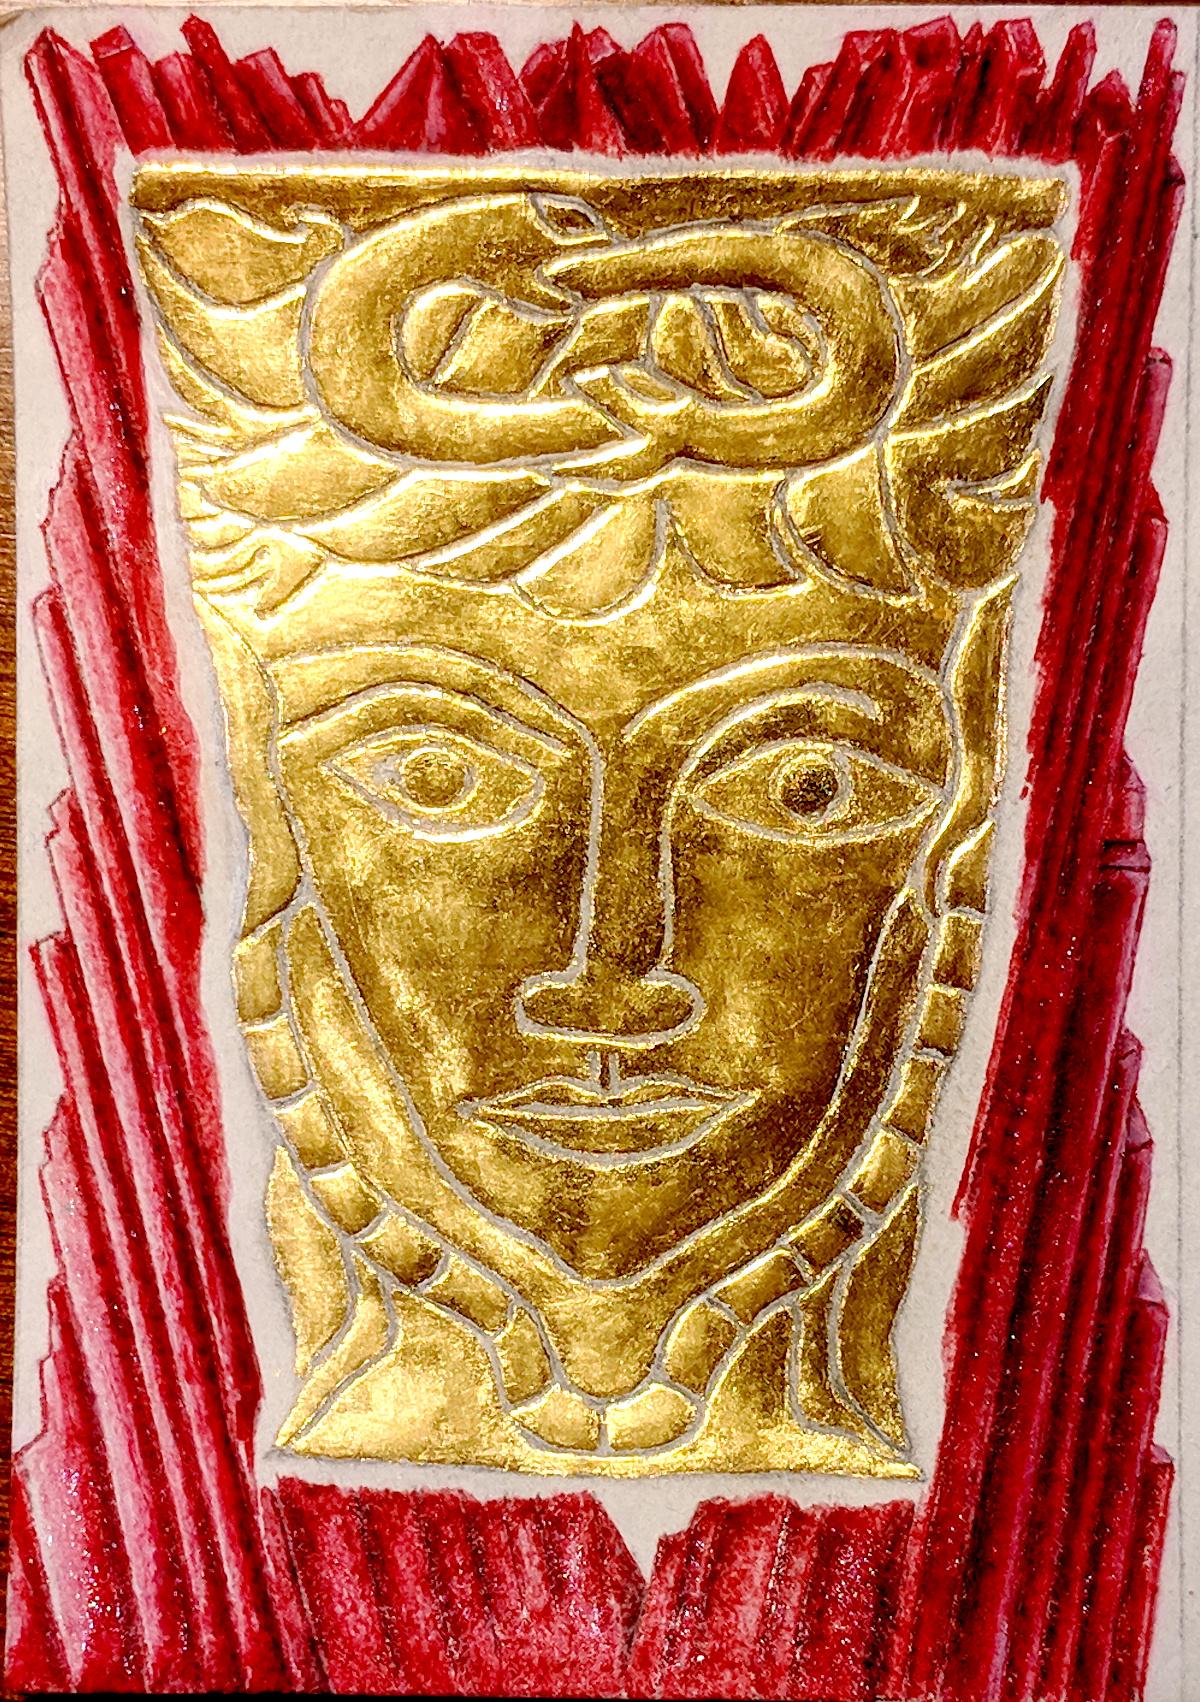 Achaemenid gold cup